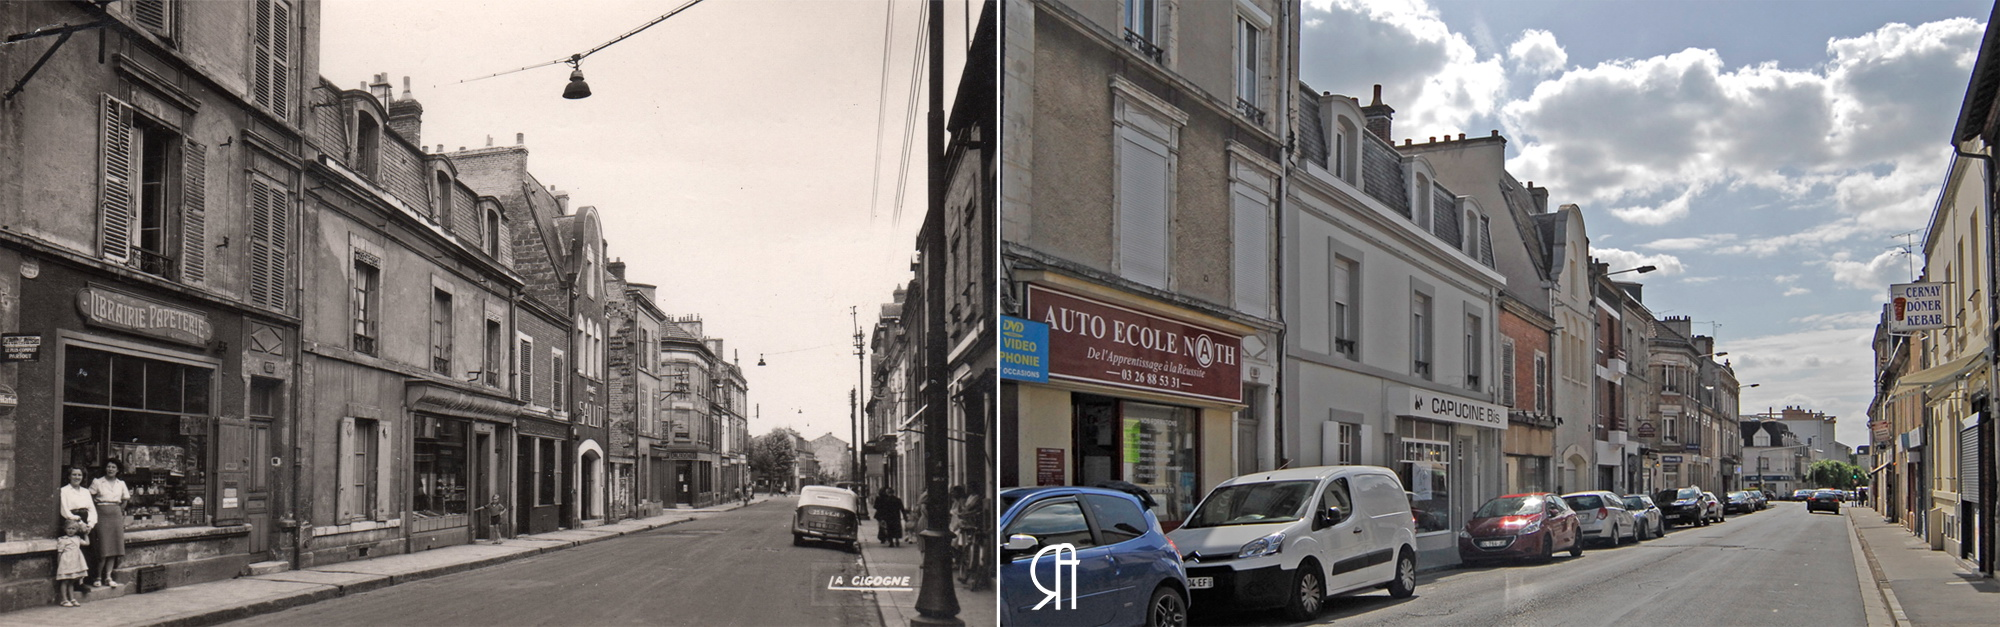 La rue de Cernay, années 50 ?